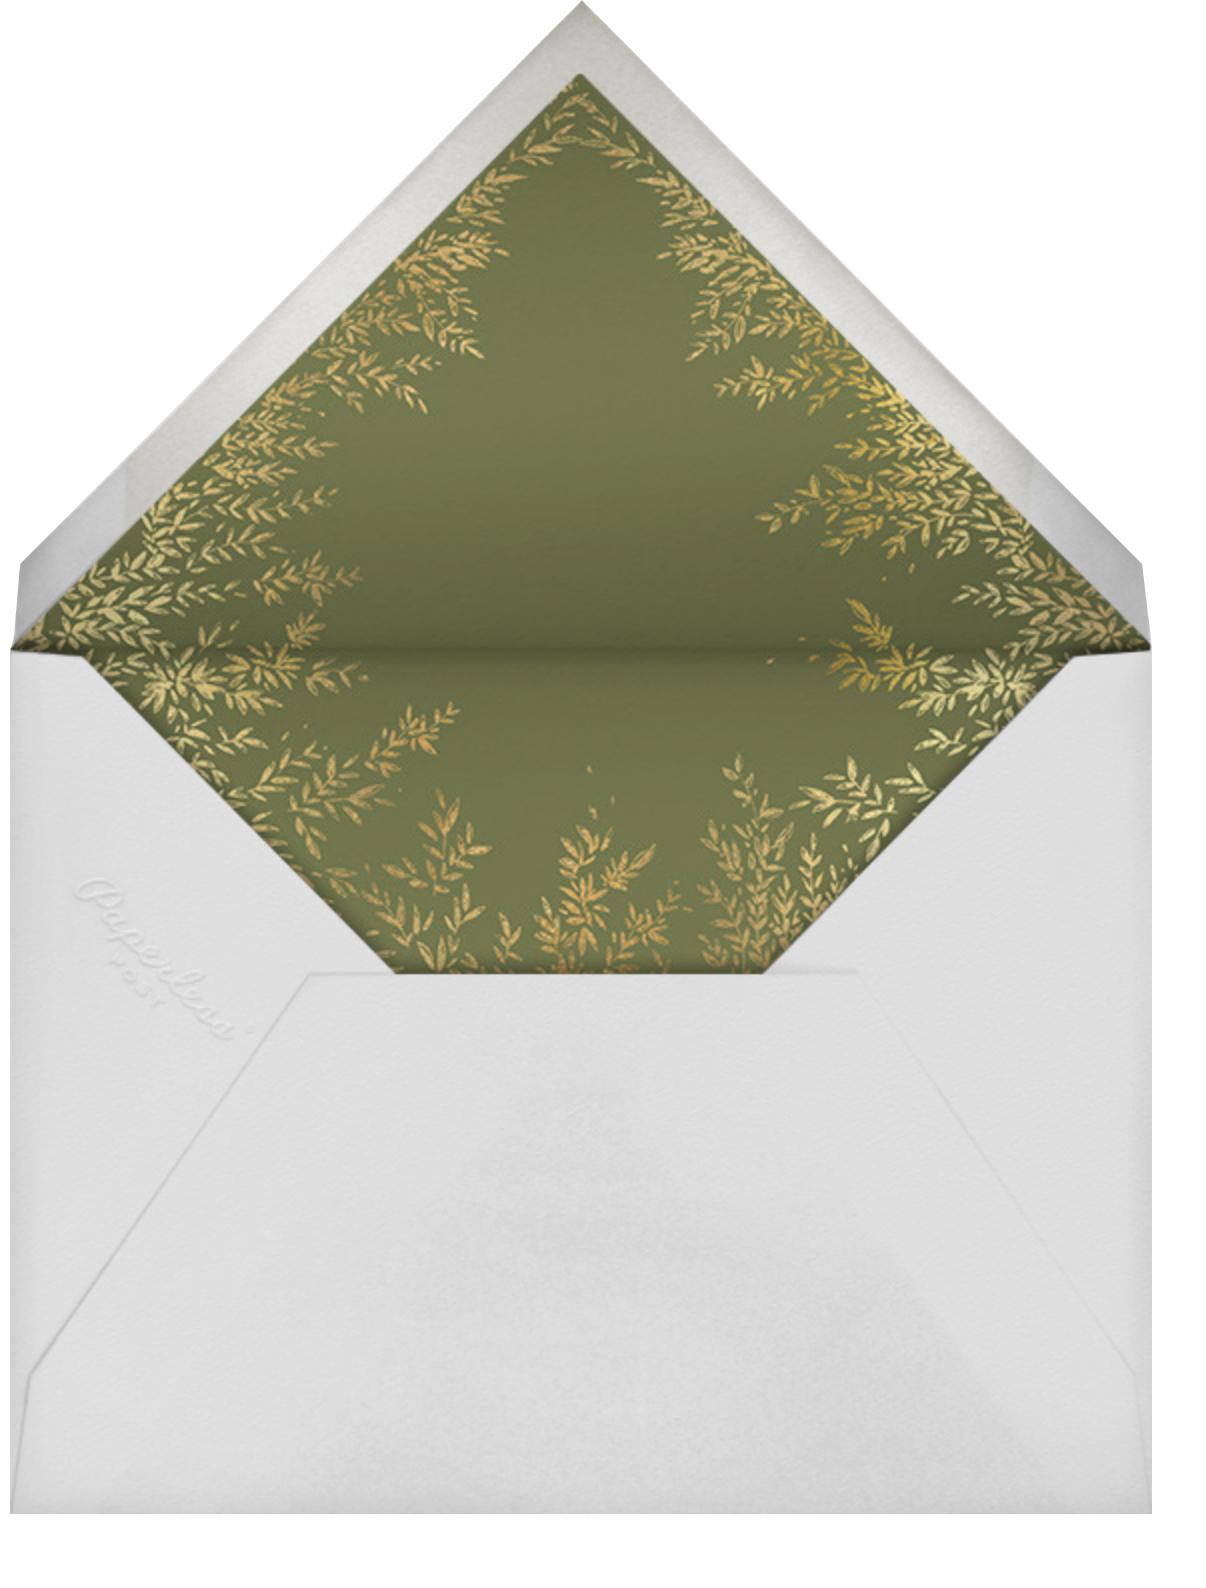 Leaves of Gold (Invitation) - Paperless Post - All - envelope back